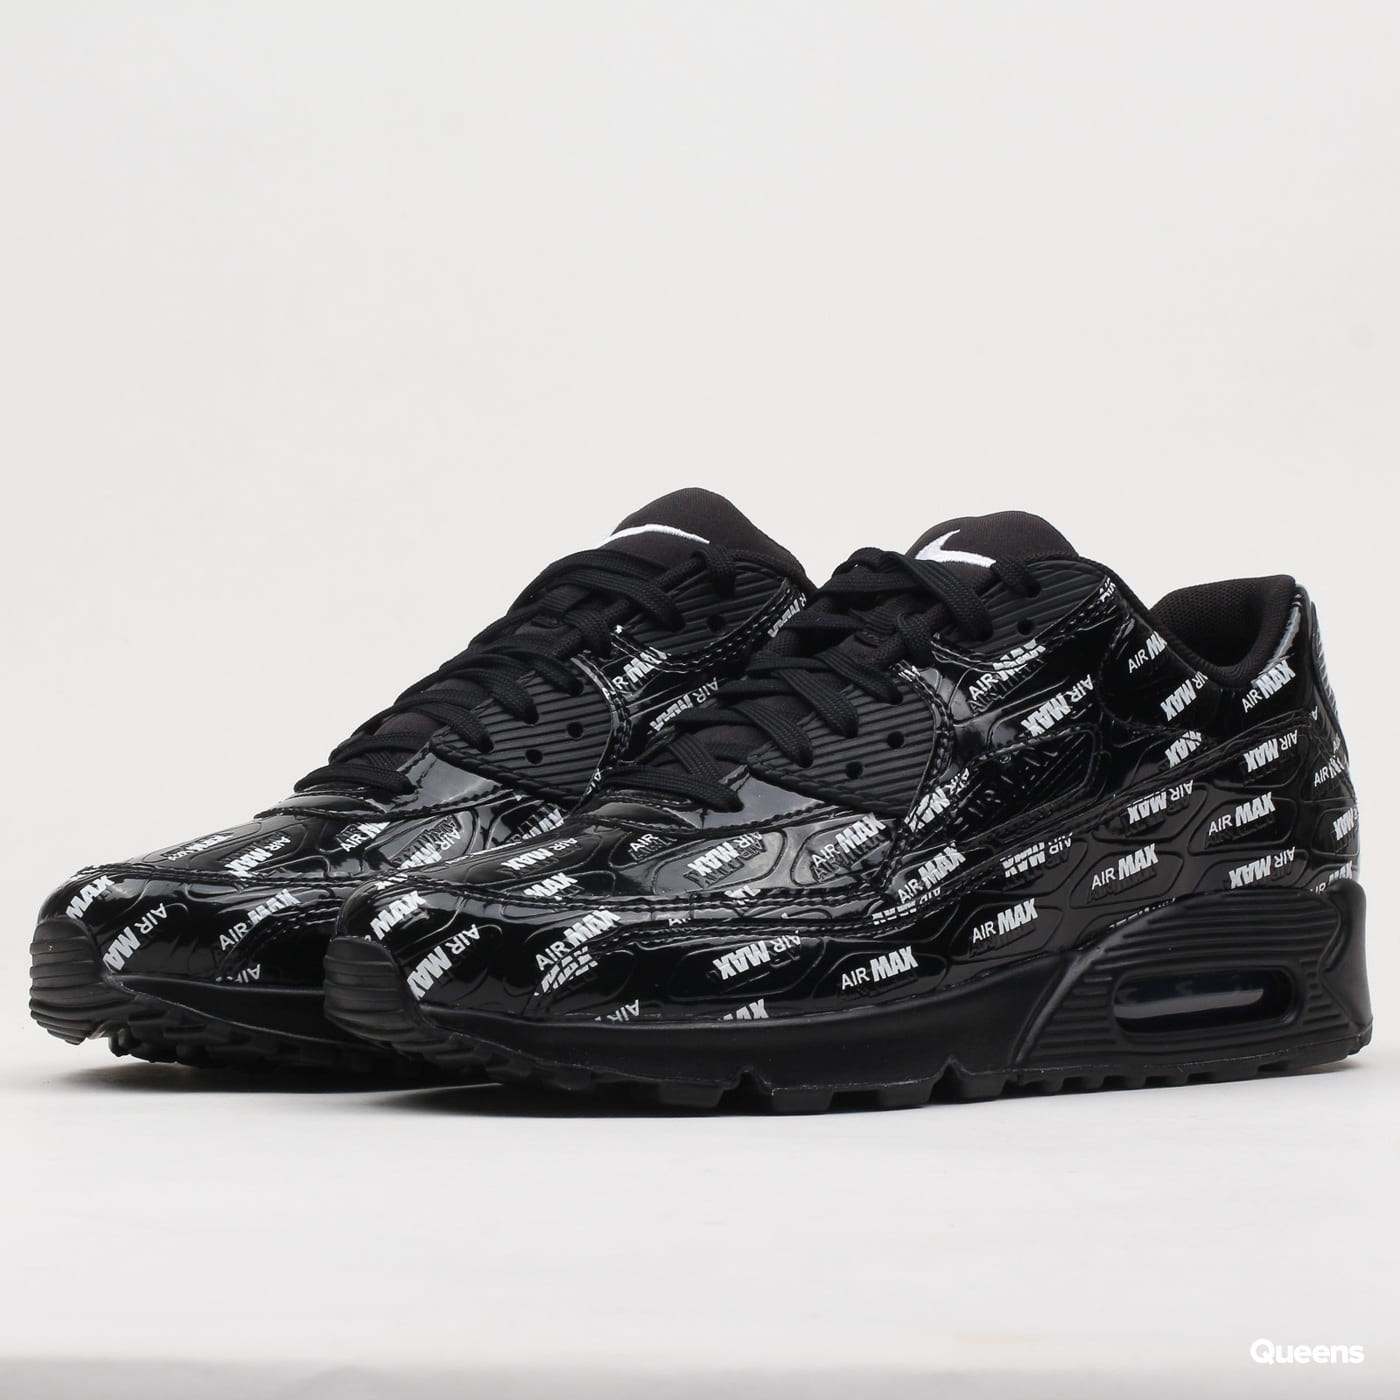 new concept 8cae5 f90fc Sneakers Nike Air Max 90 Premium (700155-015)– Queens 💚